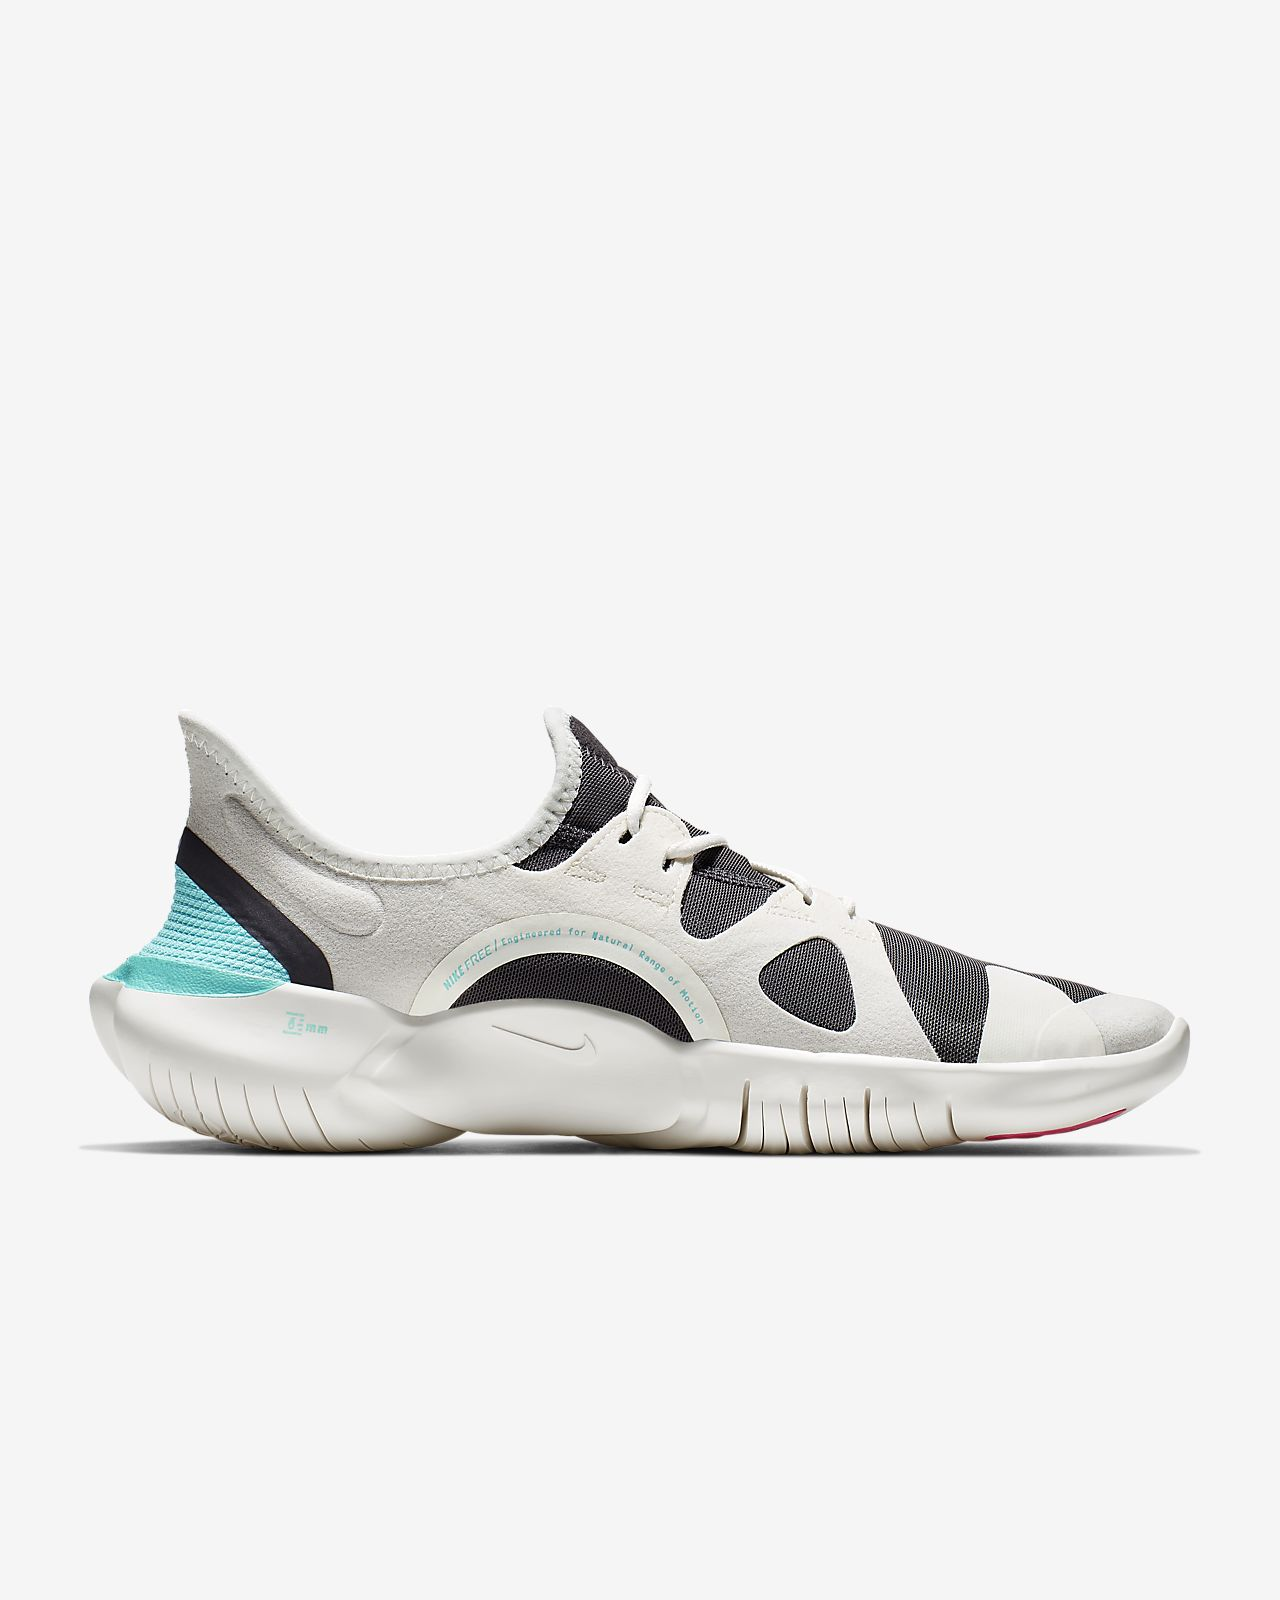 new product 76eed 96f68 ... Löparsko Nike Free RN 5.0 för kvinnor